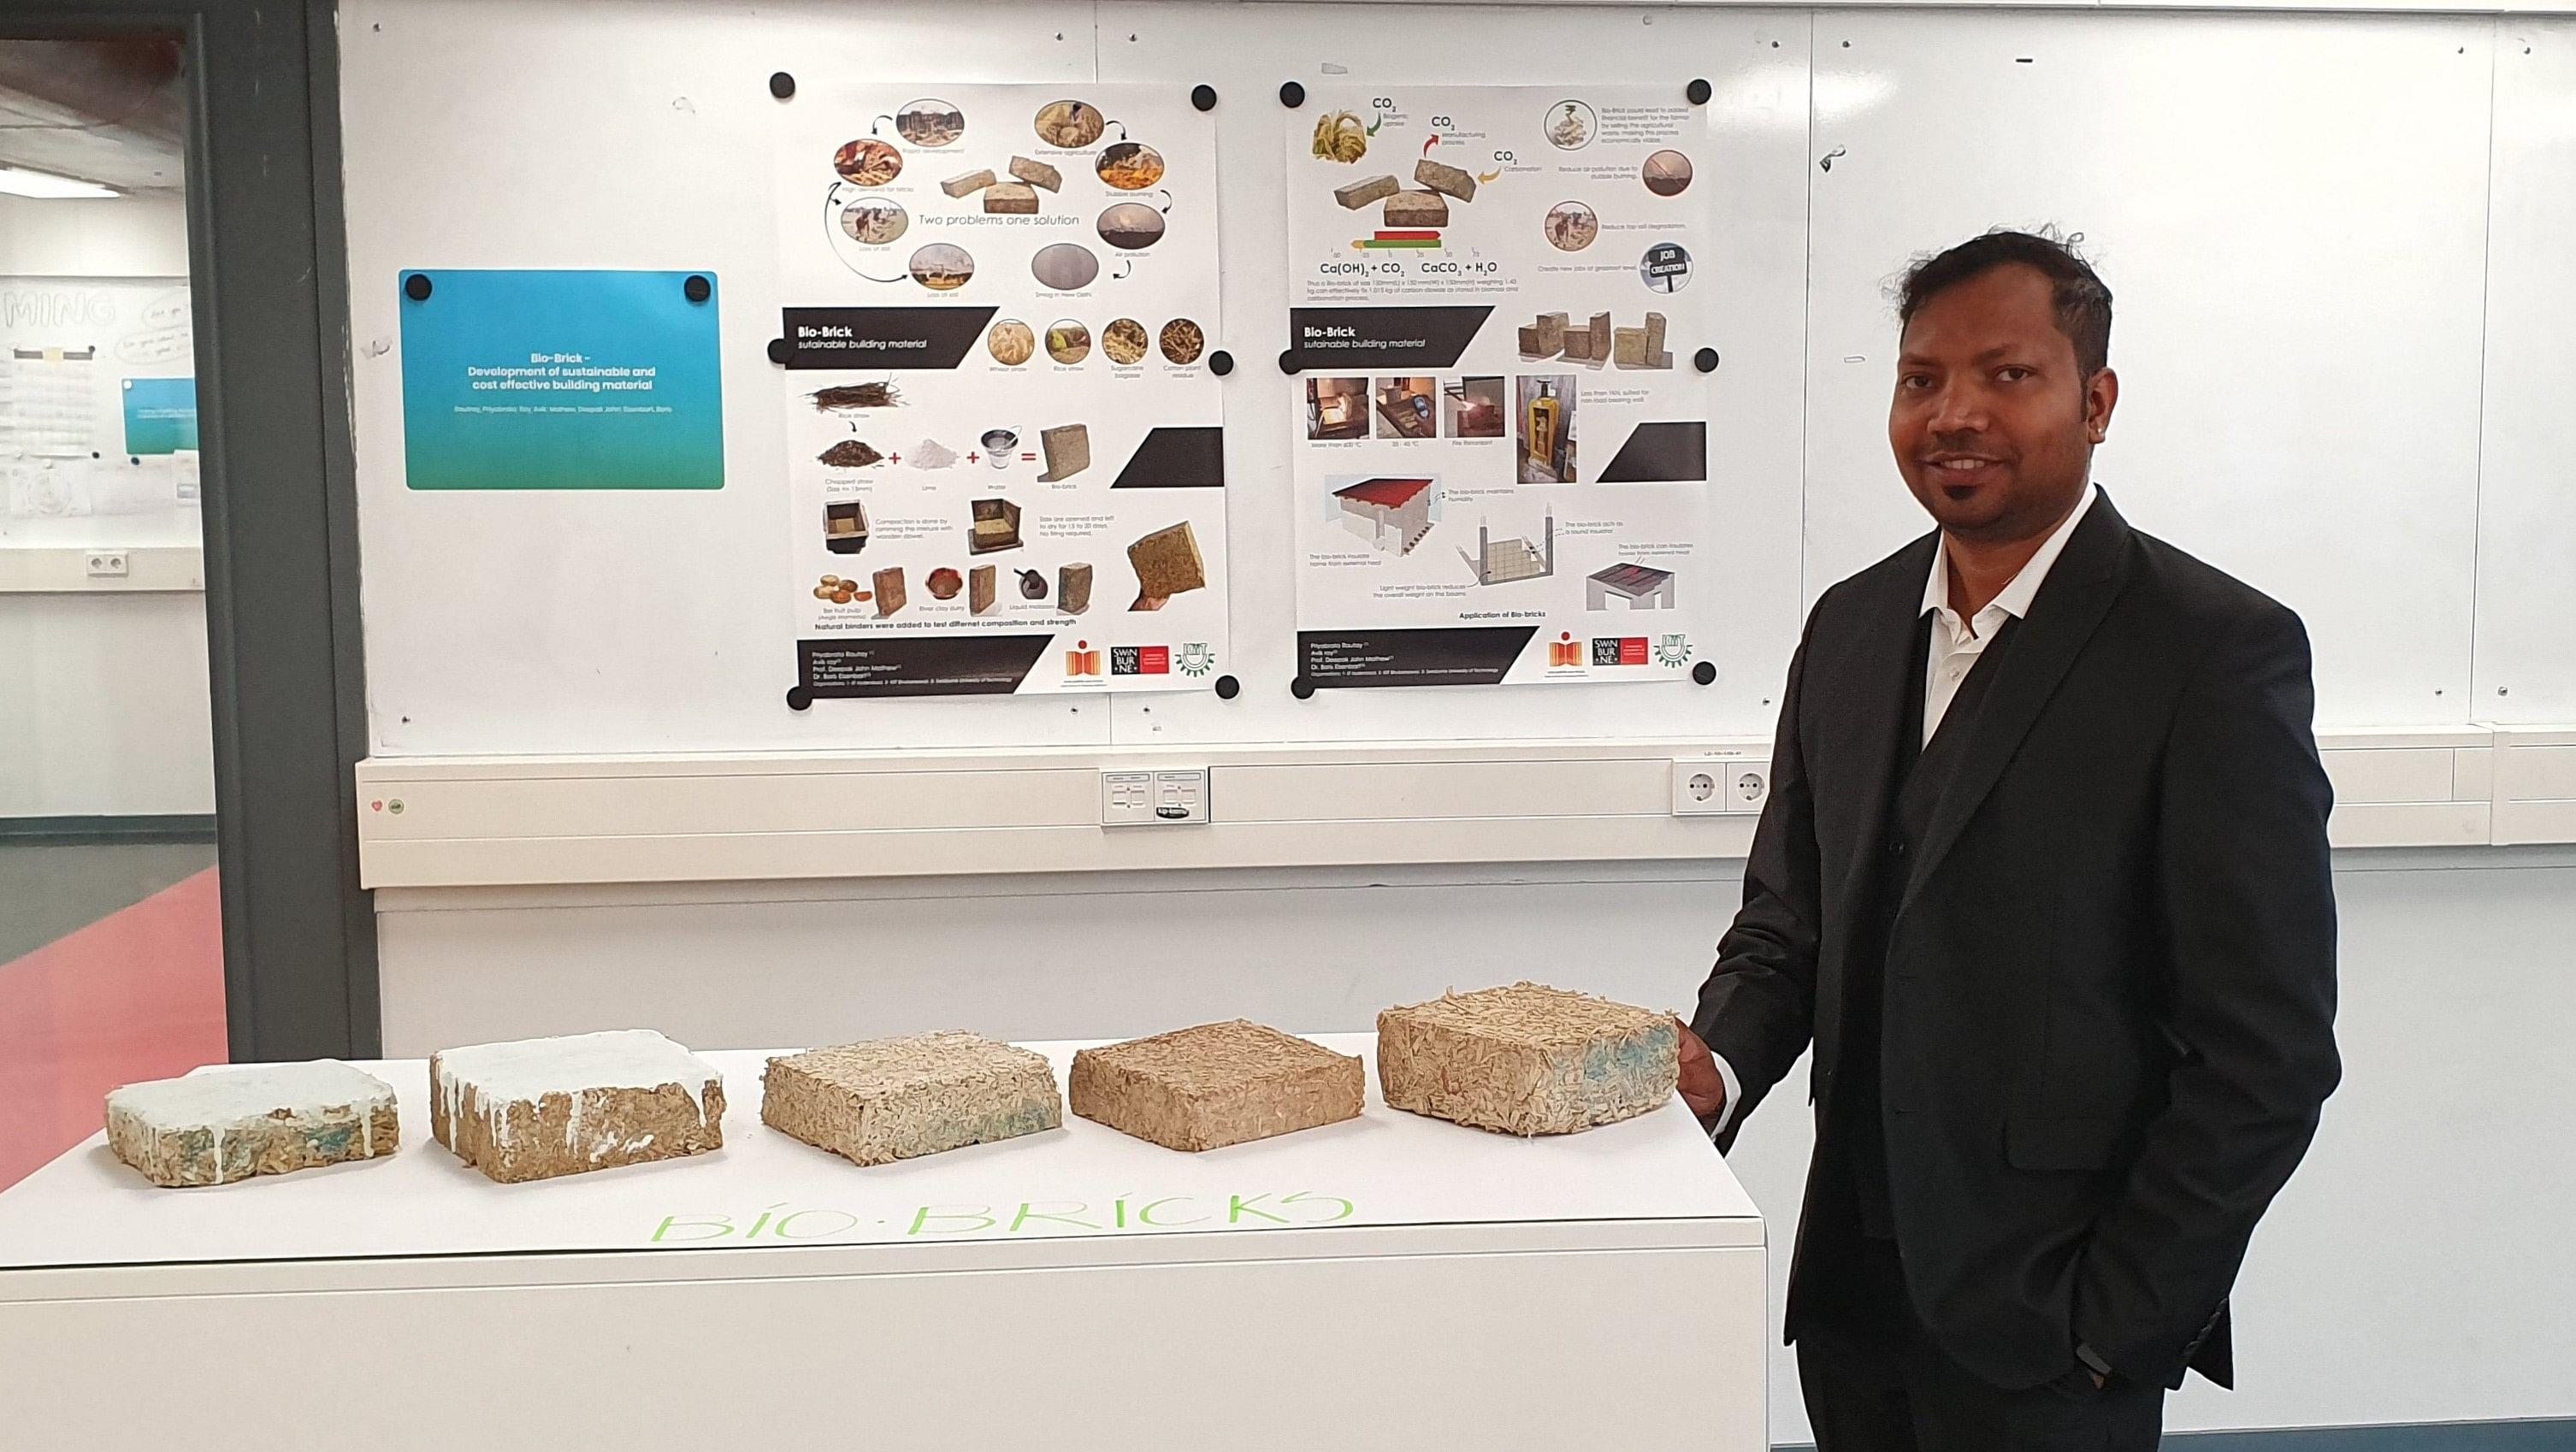 Ar. Priyabrata Rautray, PhD scholar, Design Department, IIT Hyderabad, with the 'Bio-Bricks' at International Conference on Engineering Design (ICED-2019) at TU Delft, Netherlands. (Source: IIT-Hyderabad)